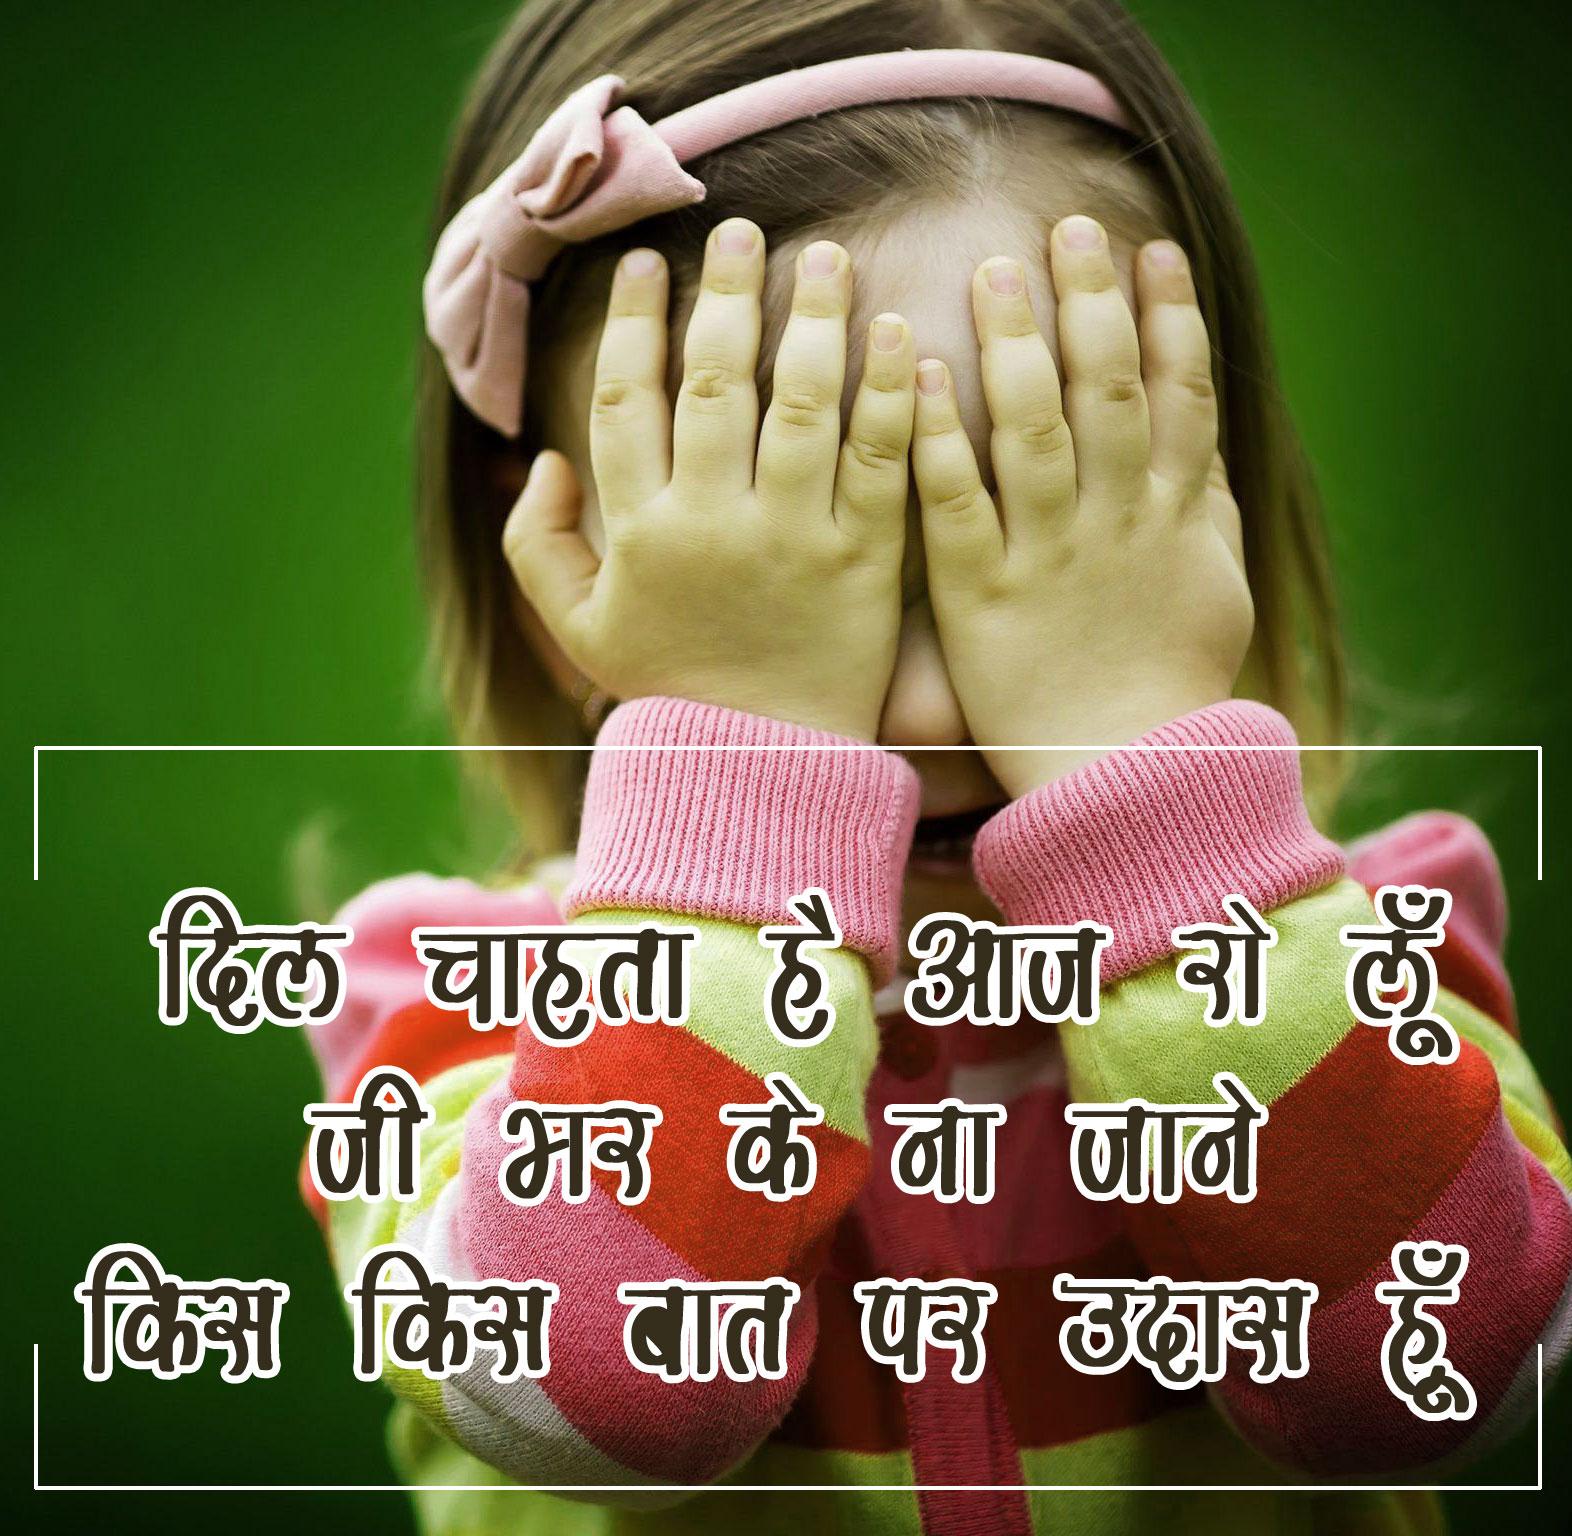 Hindi Whatsapp DP Status Images Free